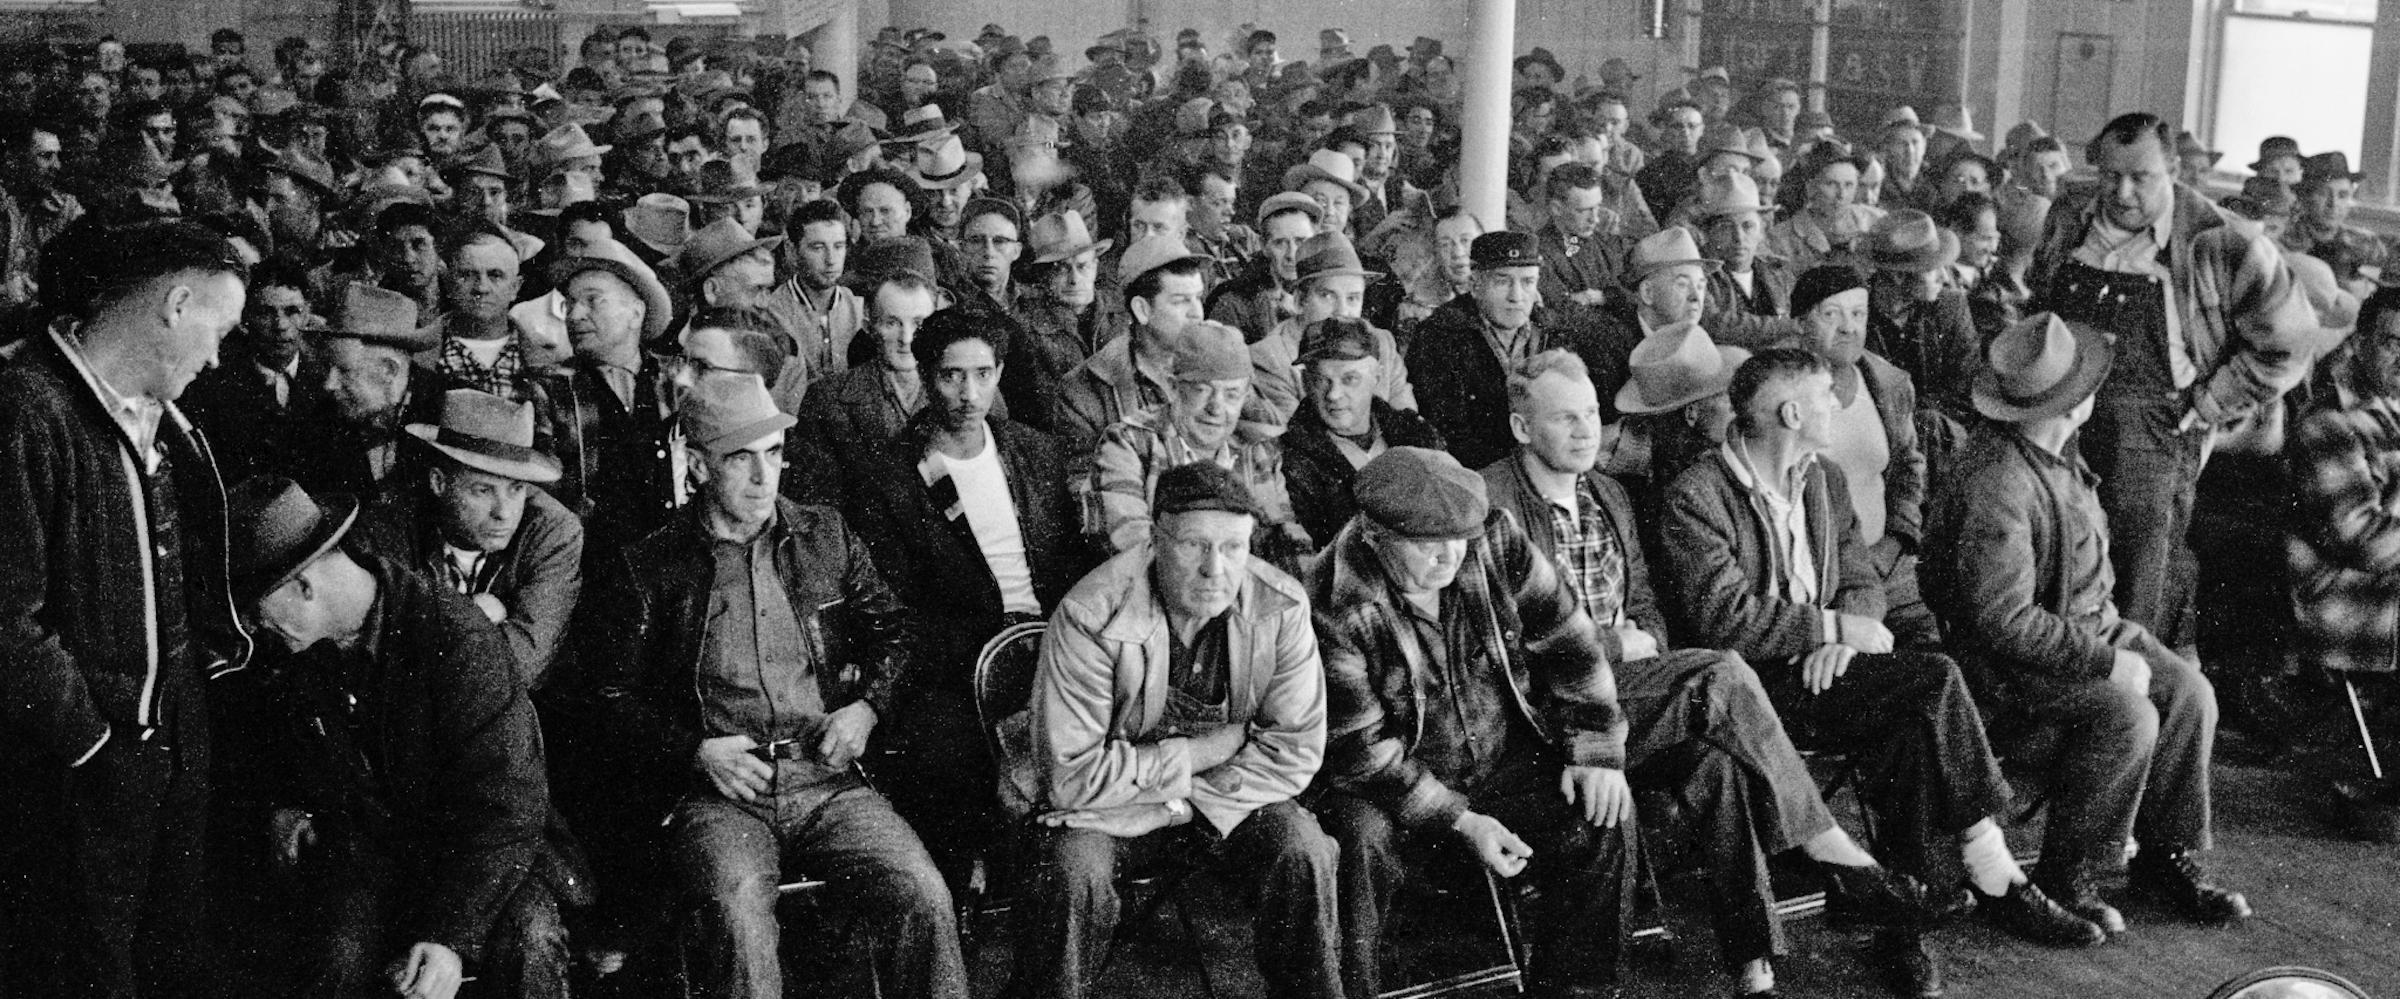 Union hall crowd sitting1 header image 2400